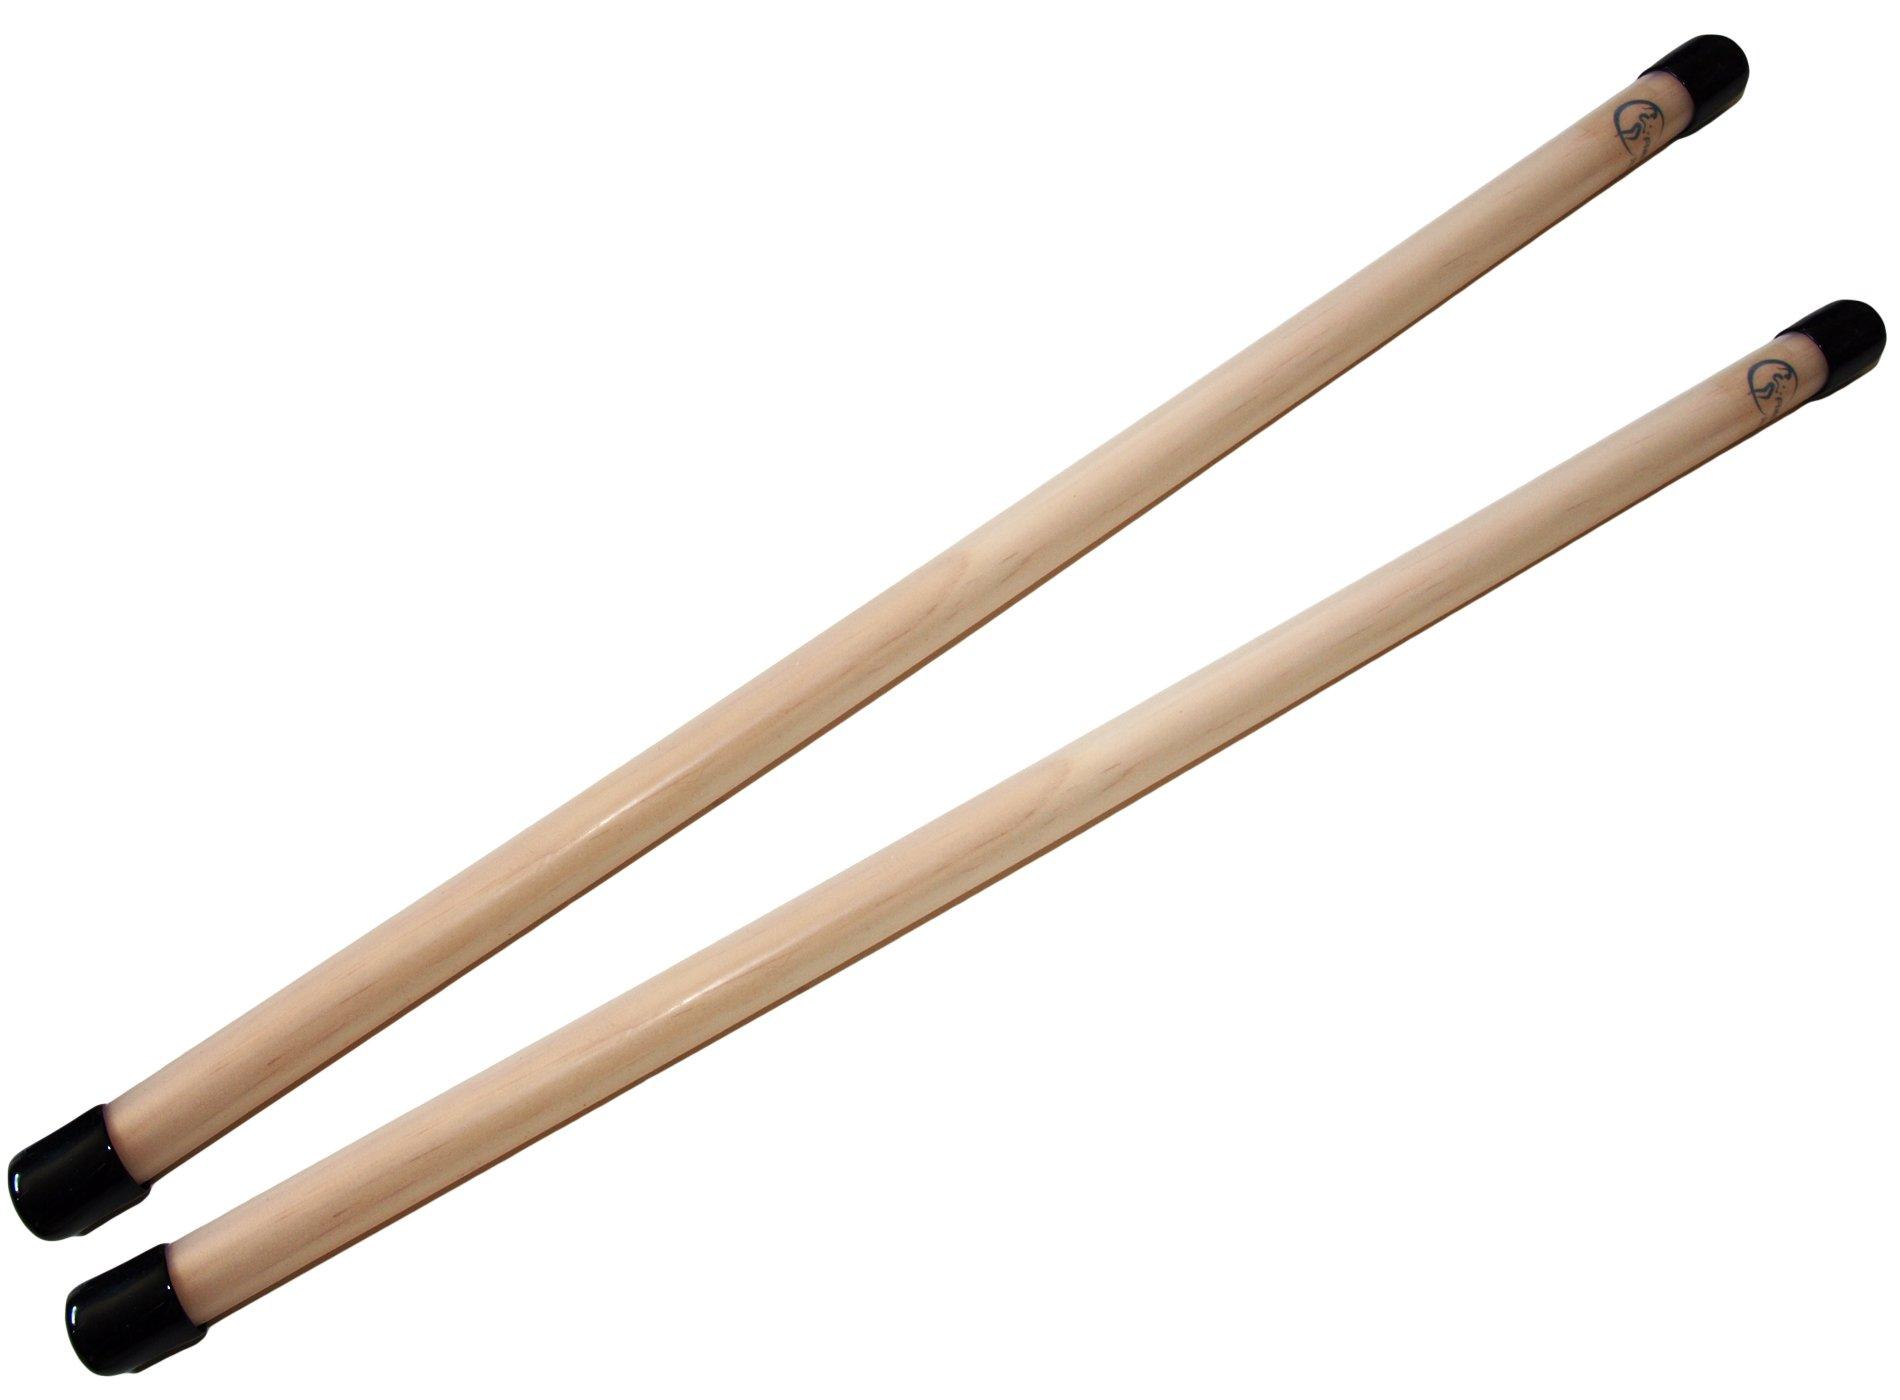 FLASH Pro Flower Stick Set (5 Colours) Silicone Coated Flowerstick & Handsticks! Suprime Quality, Fiberglass Shaft, Silicone Grip, Suede Tassels + Velcro Strap & Travel Bag! (UV Yellow) by Flames N Games Devil Sticks/Flower Sticks (Image #9)